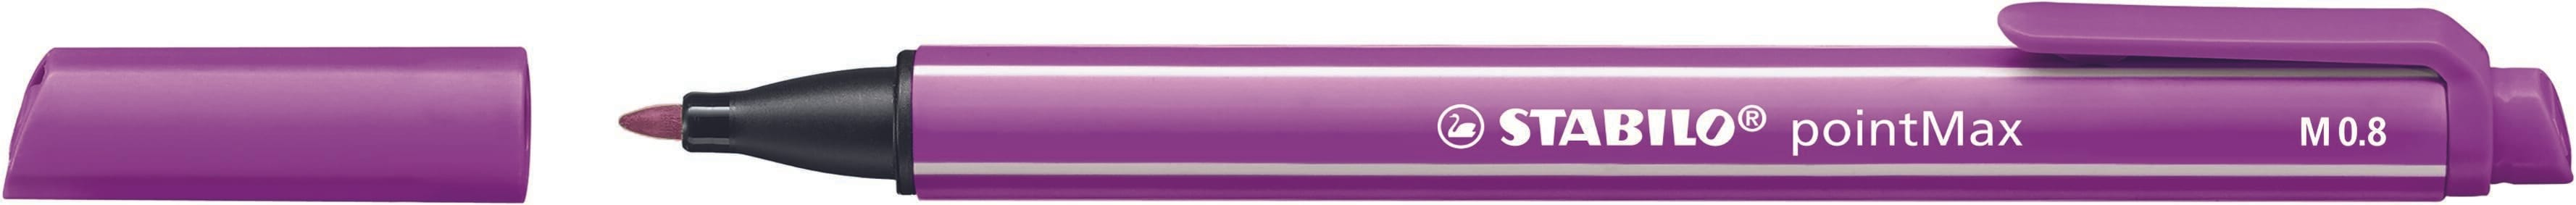 STABILO pointMax - stylo feutre - pointe moyenne - lilas